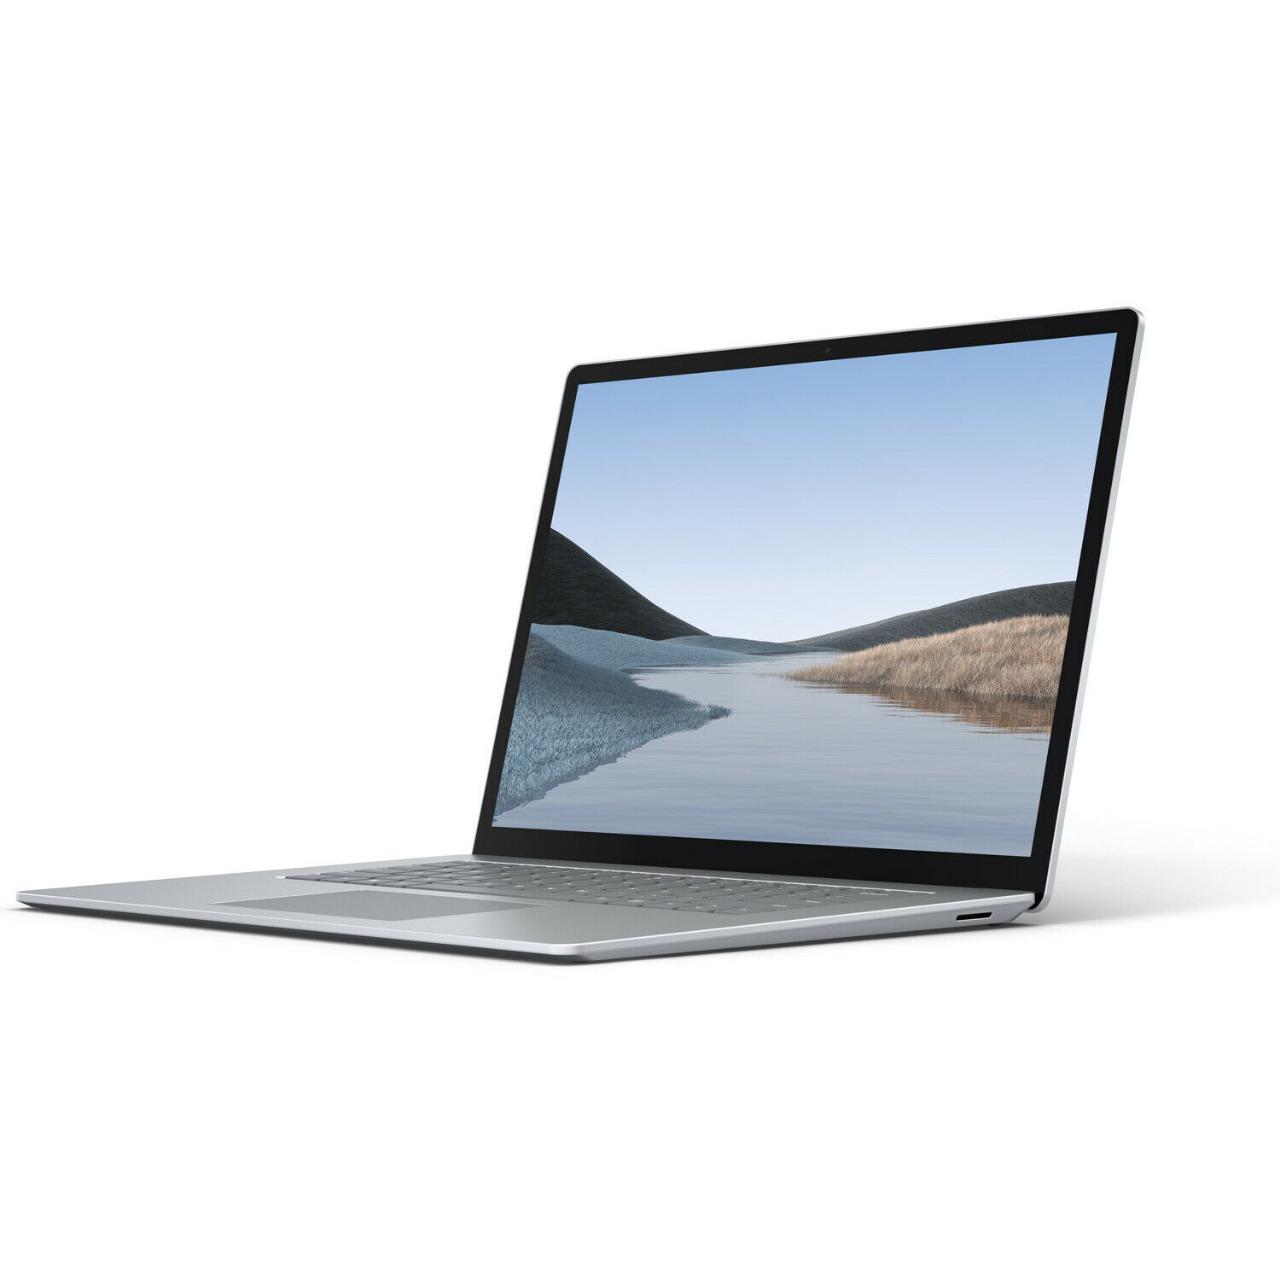 Microsoft Surface Laptop 3 15 AMD Ryzen 7 16GB RAM 512GB SSD Platium